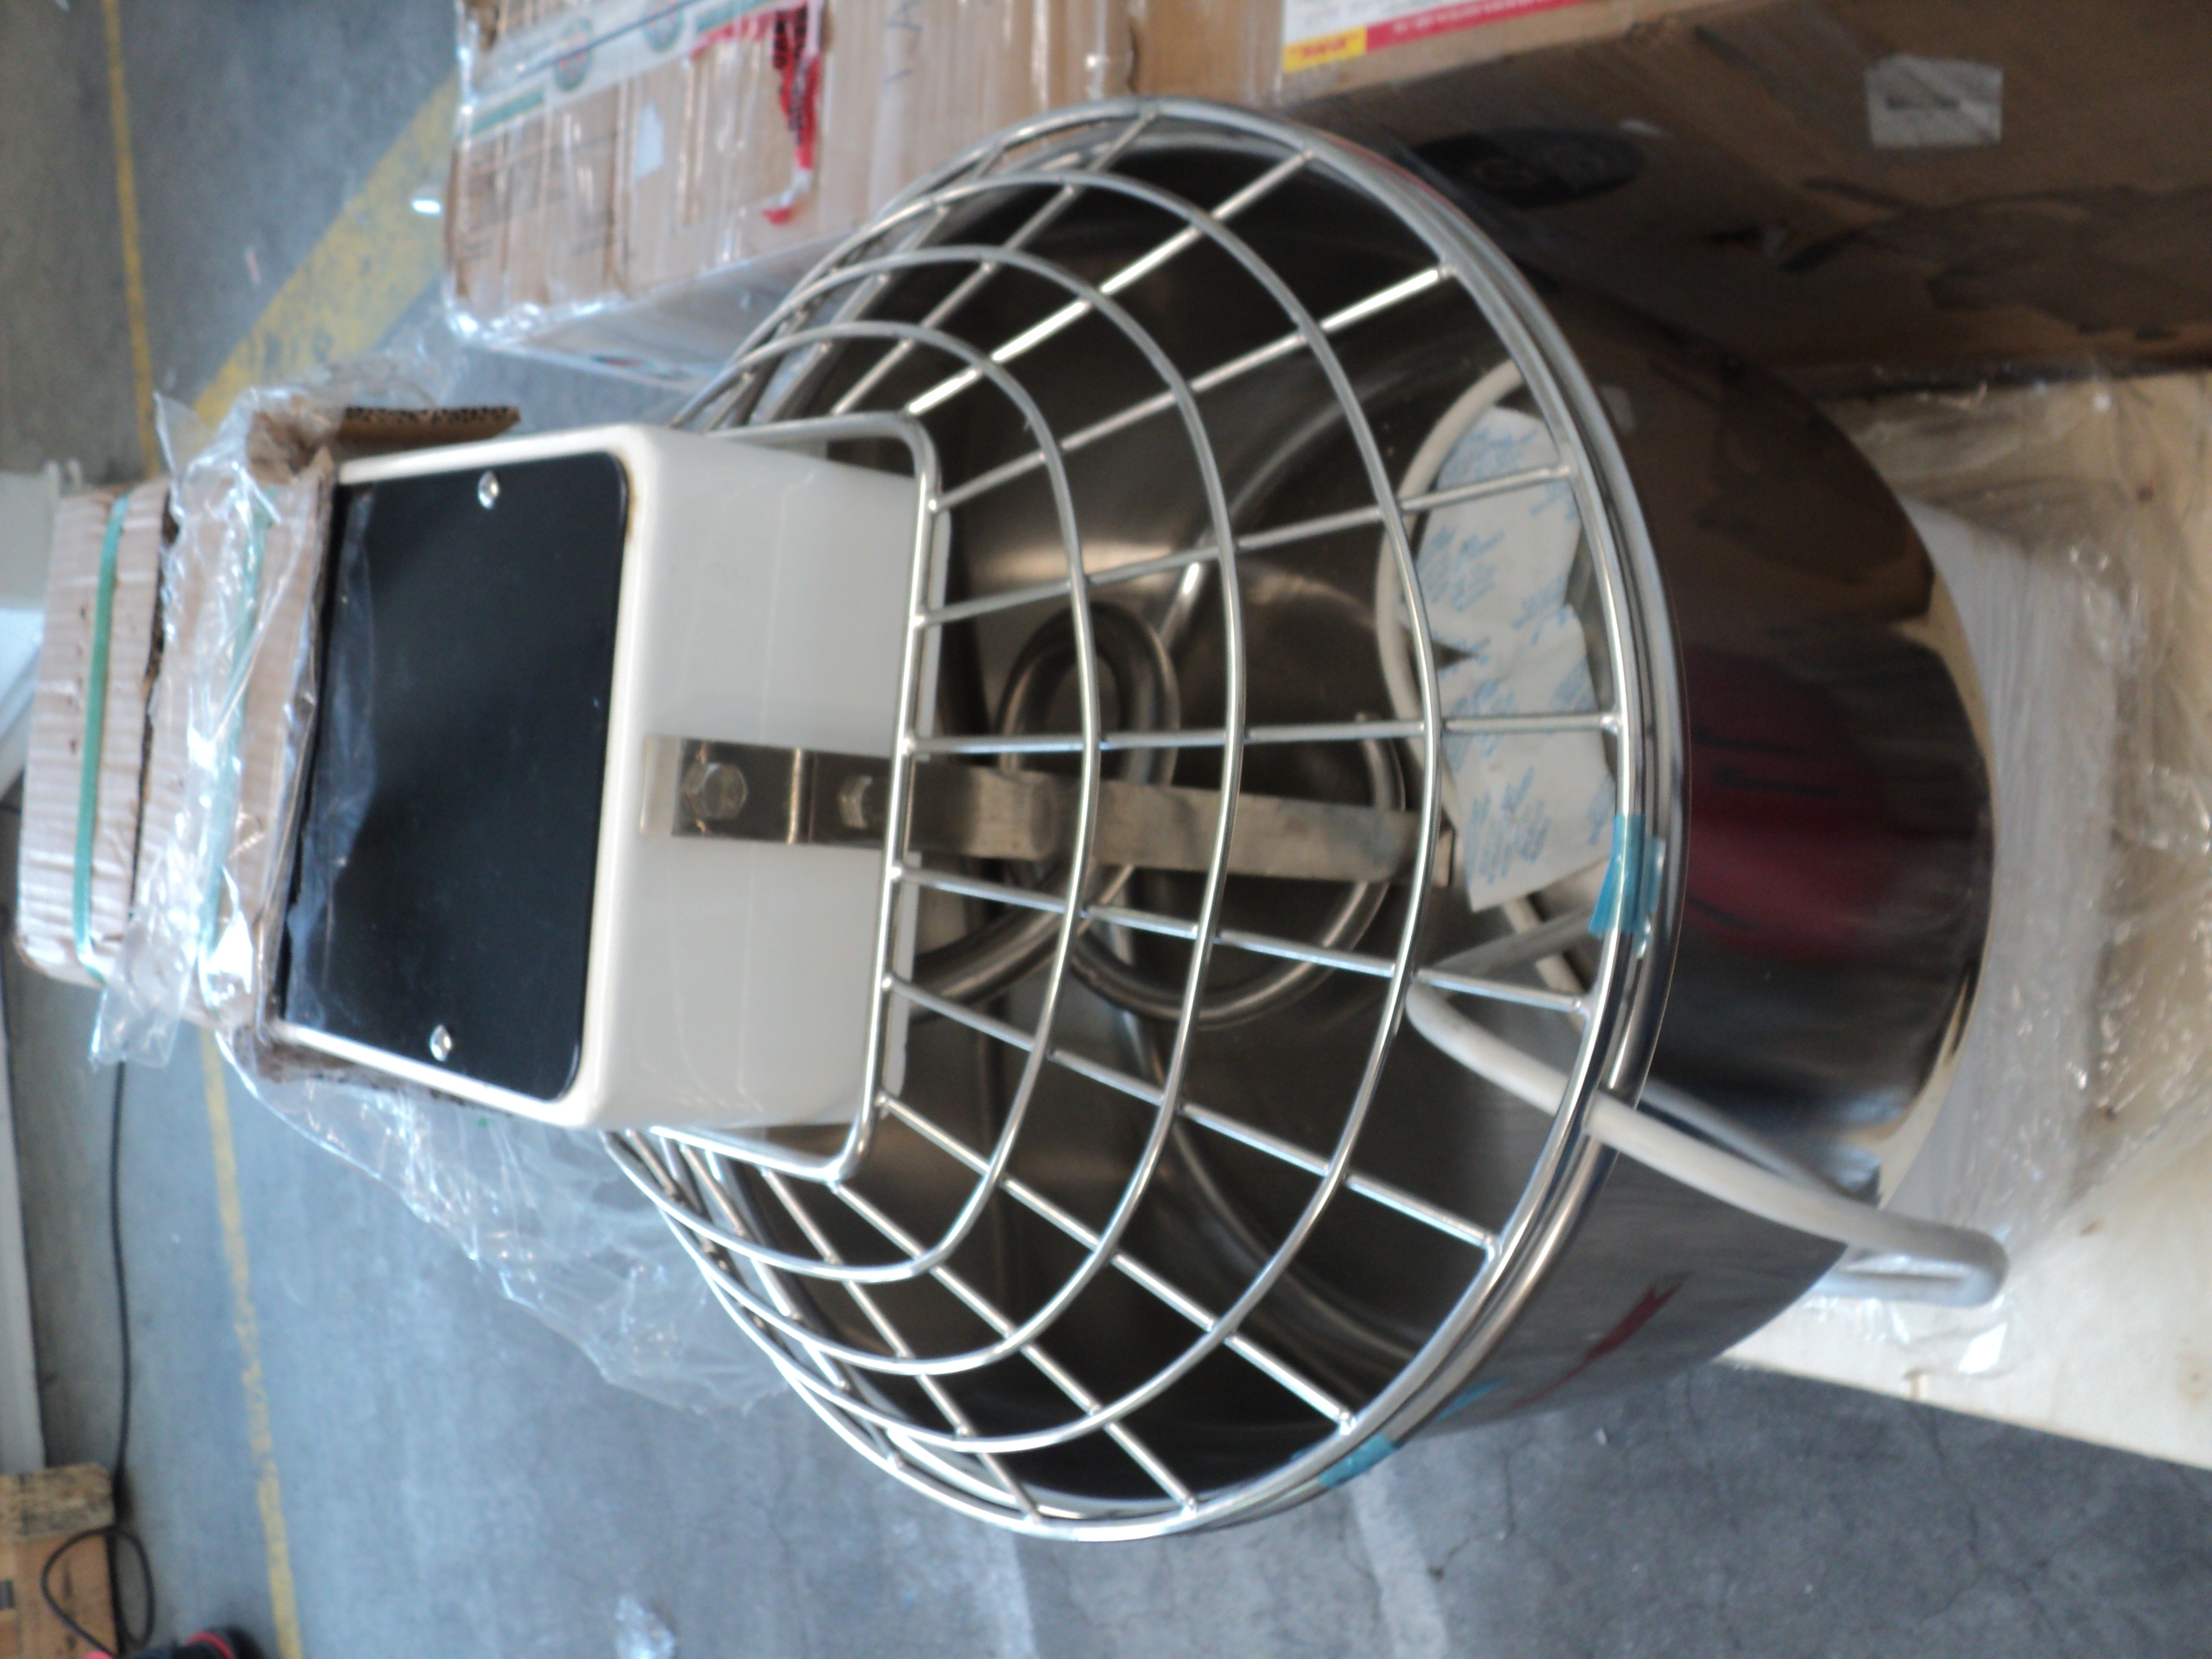 Teigknetmaschine ECO 42 400V - fester Kopf - B-Ware A3 Online-Shop ...